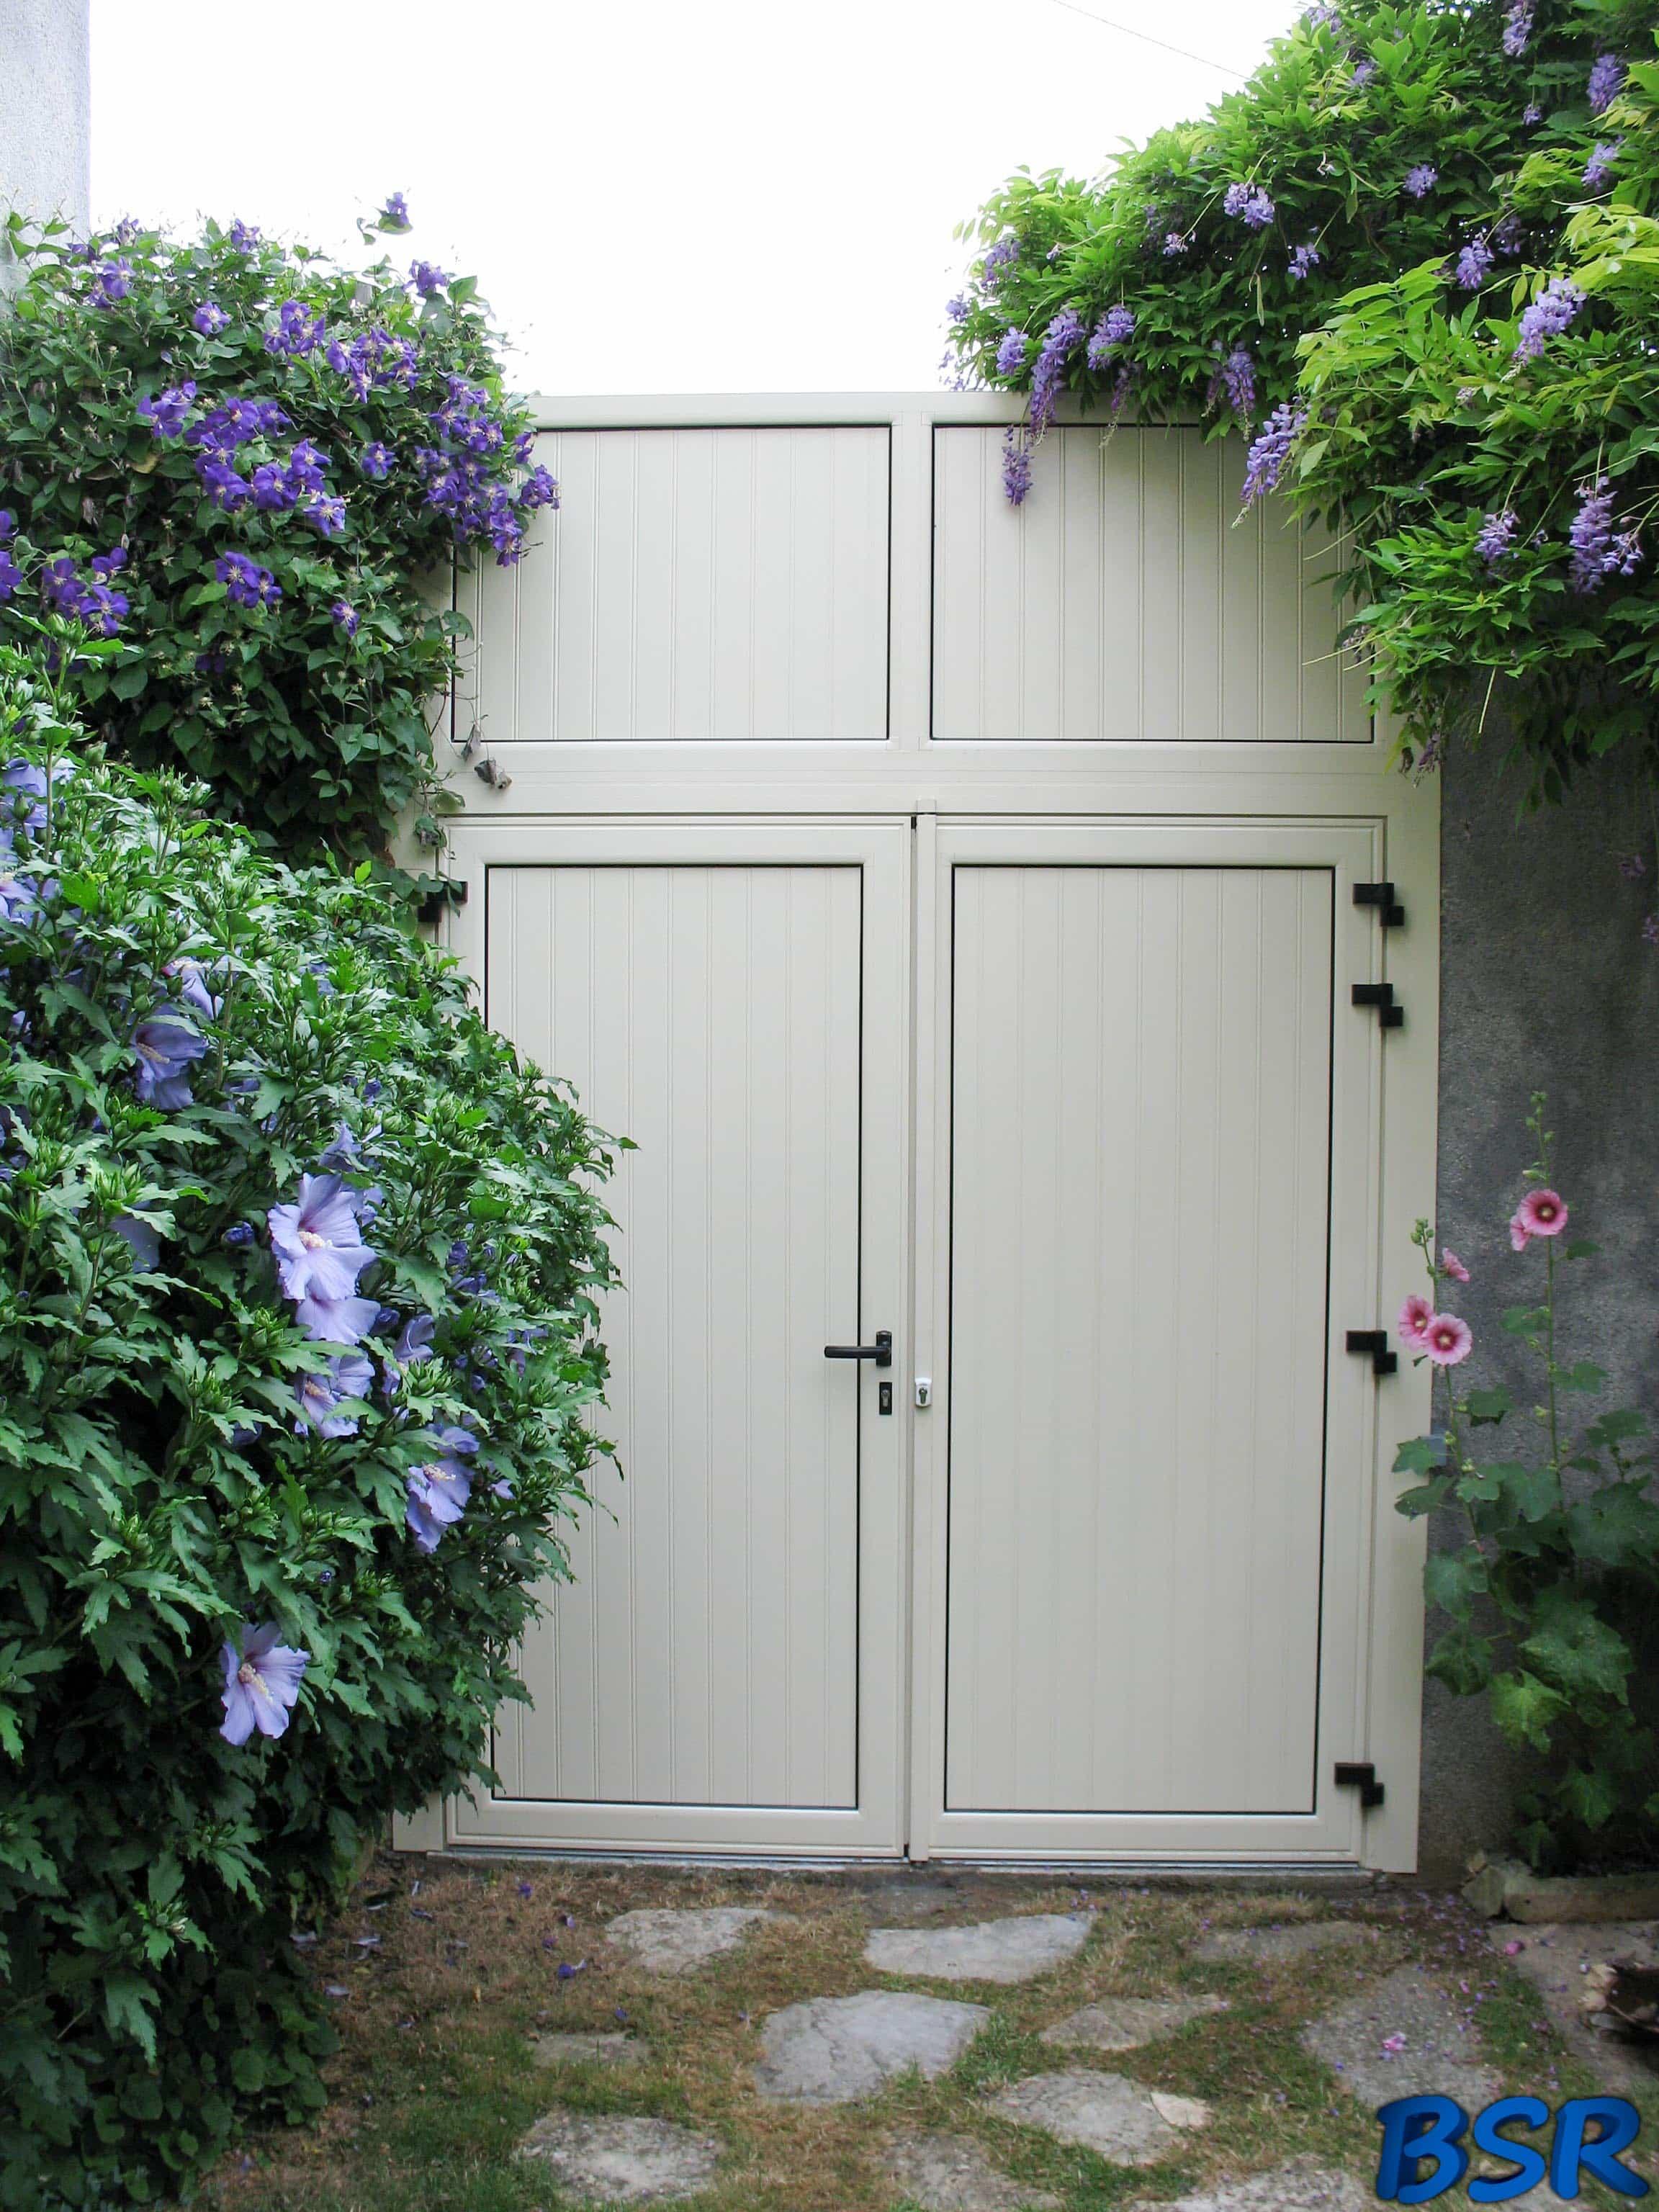 Porte et fenêtre Aluminium BSR 012